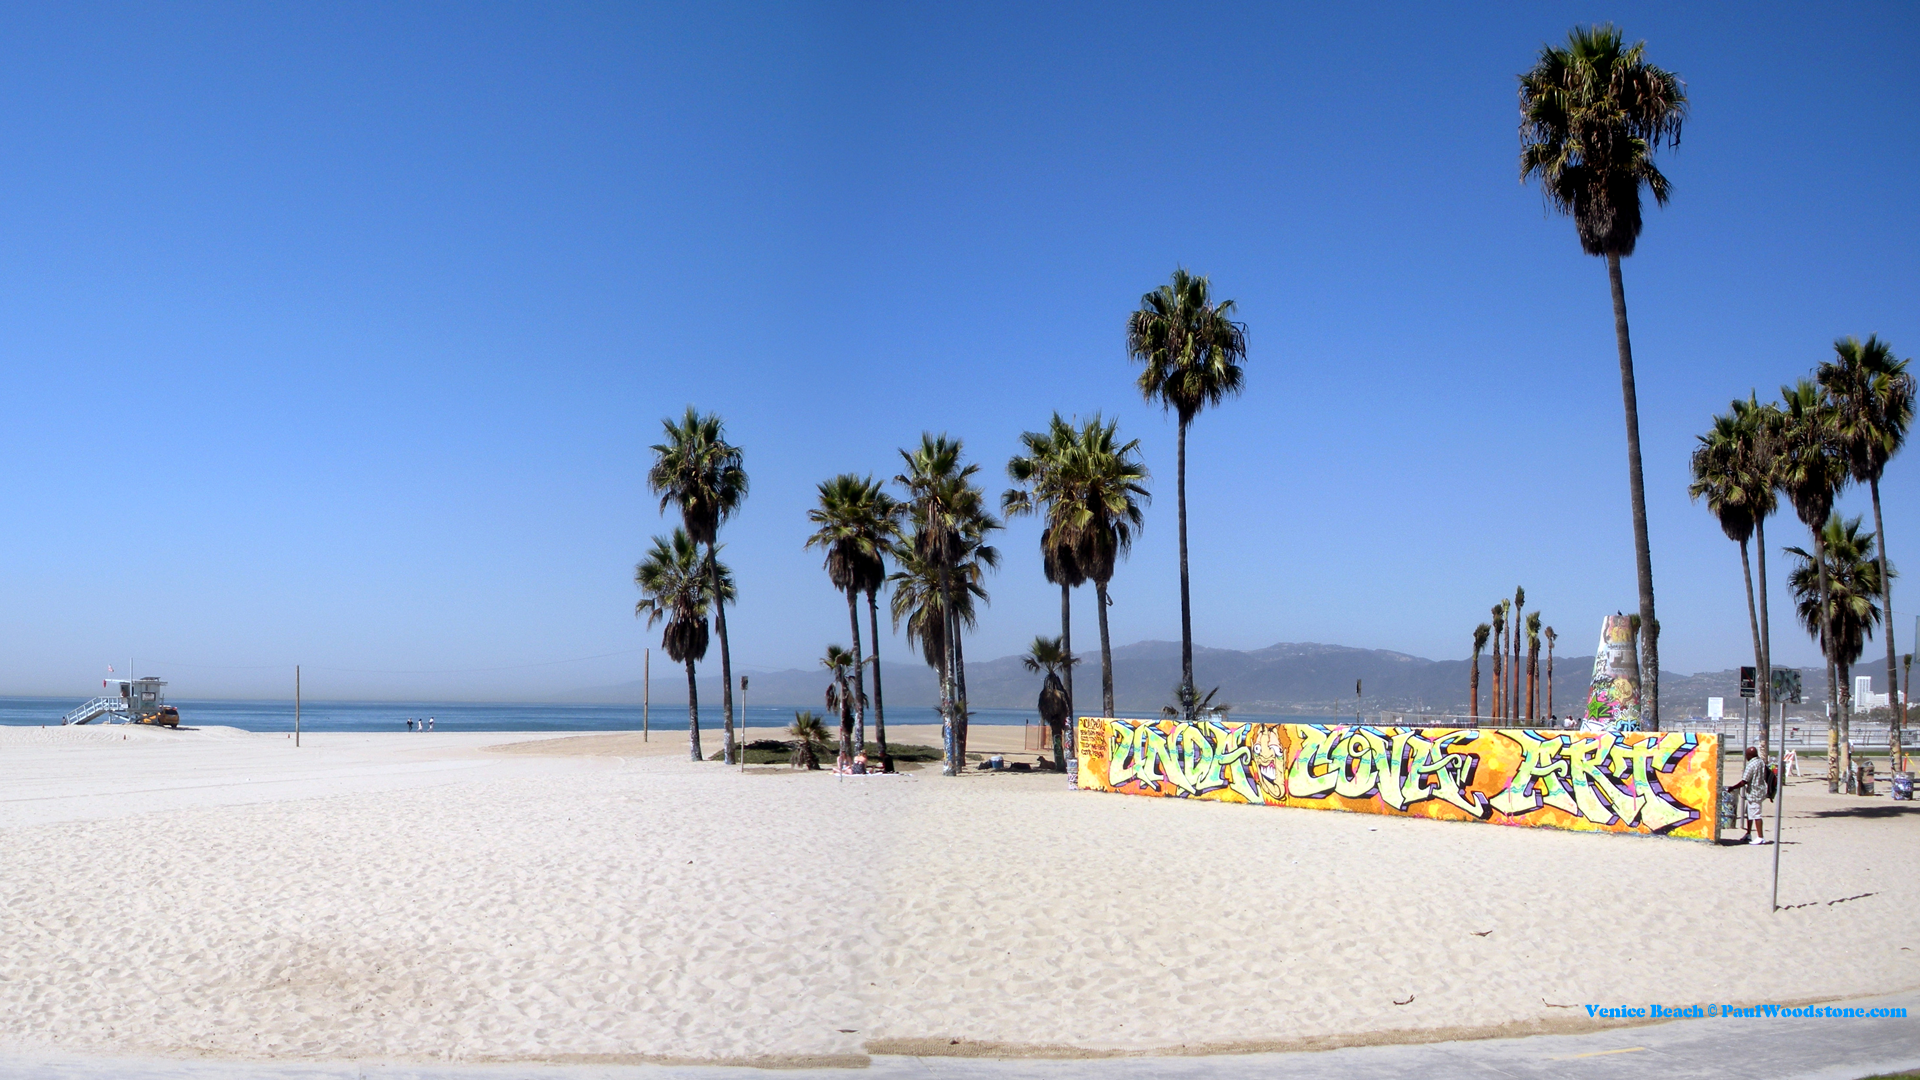 Venice Beach 1920x1080